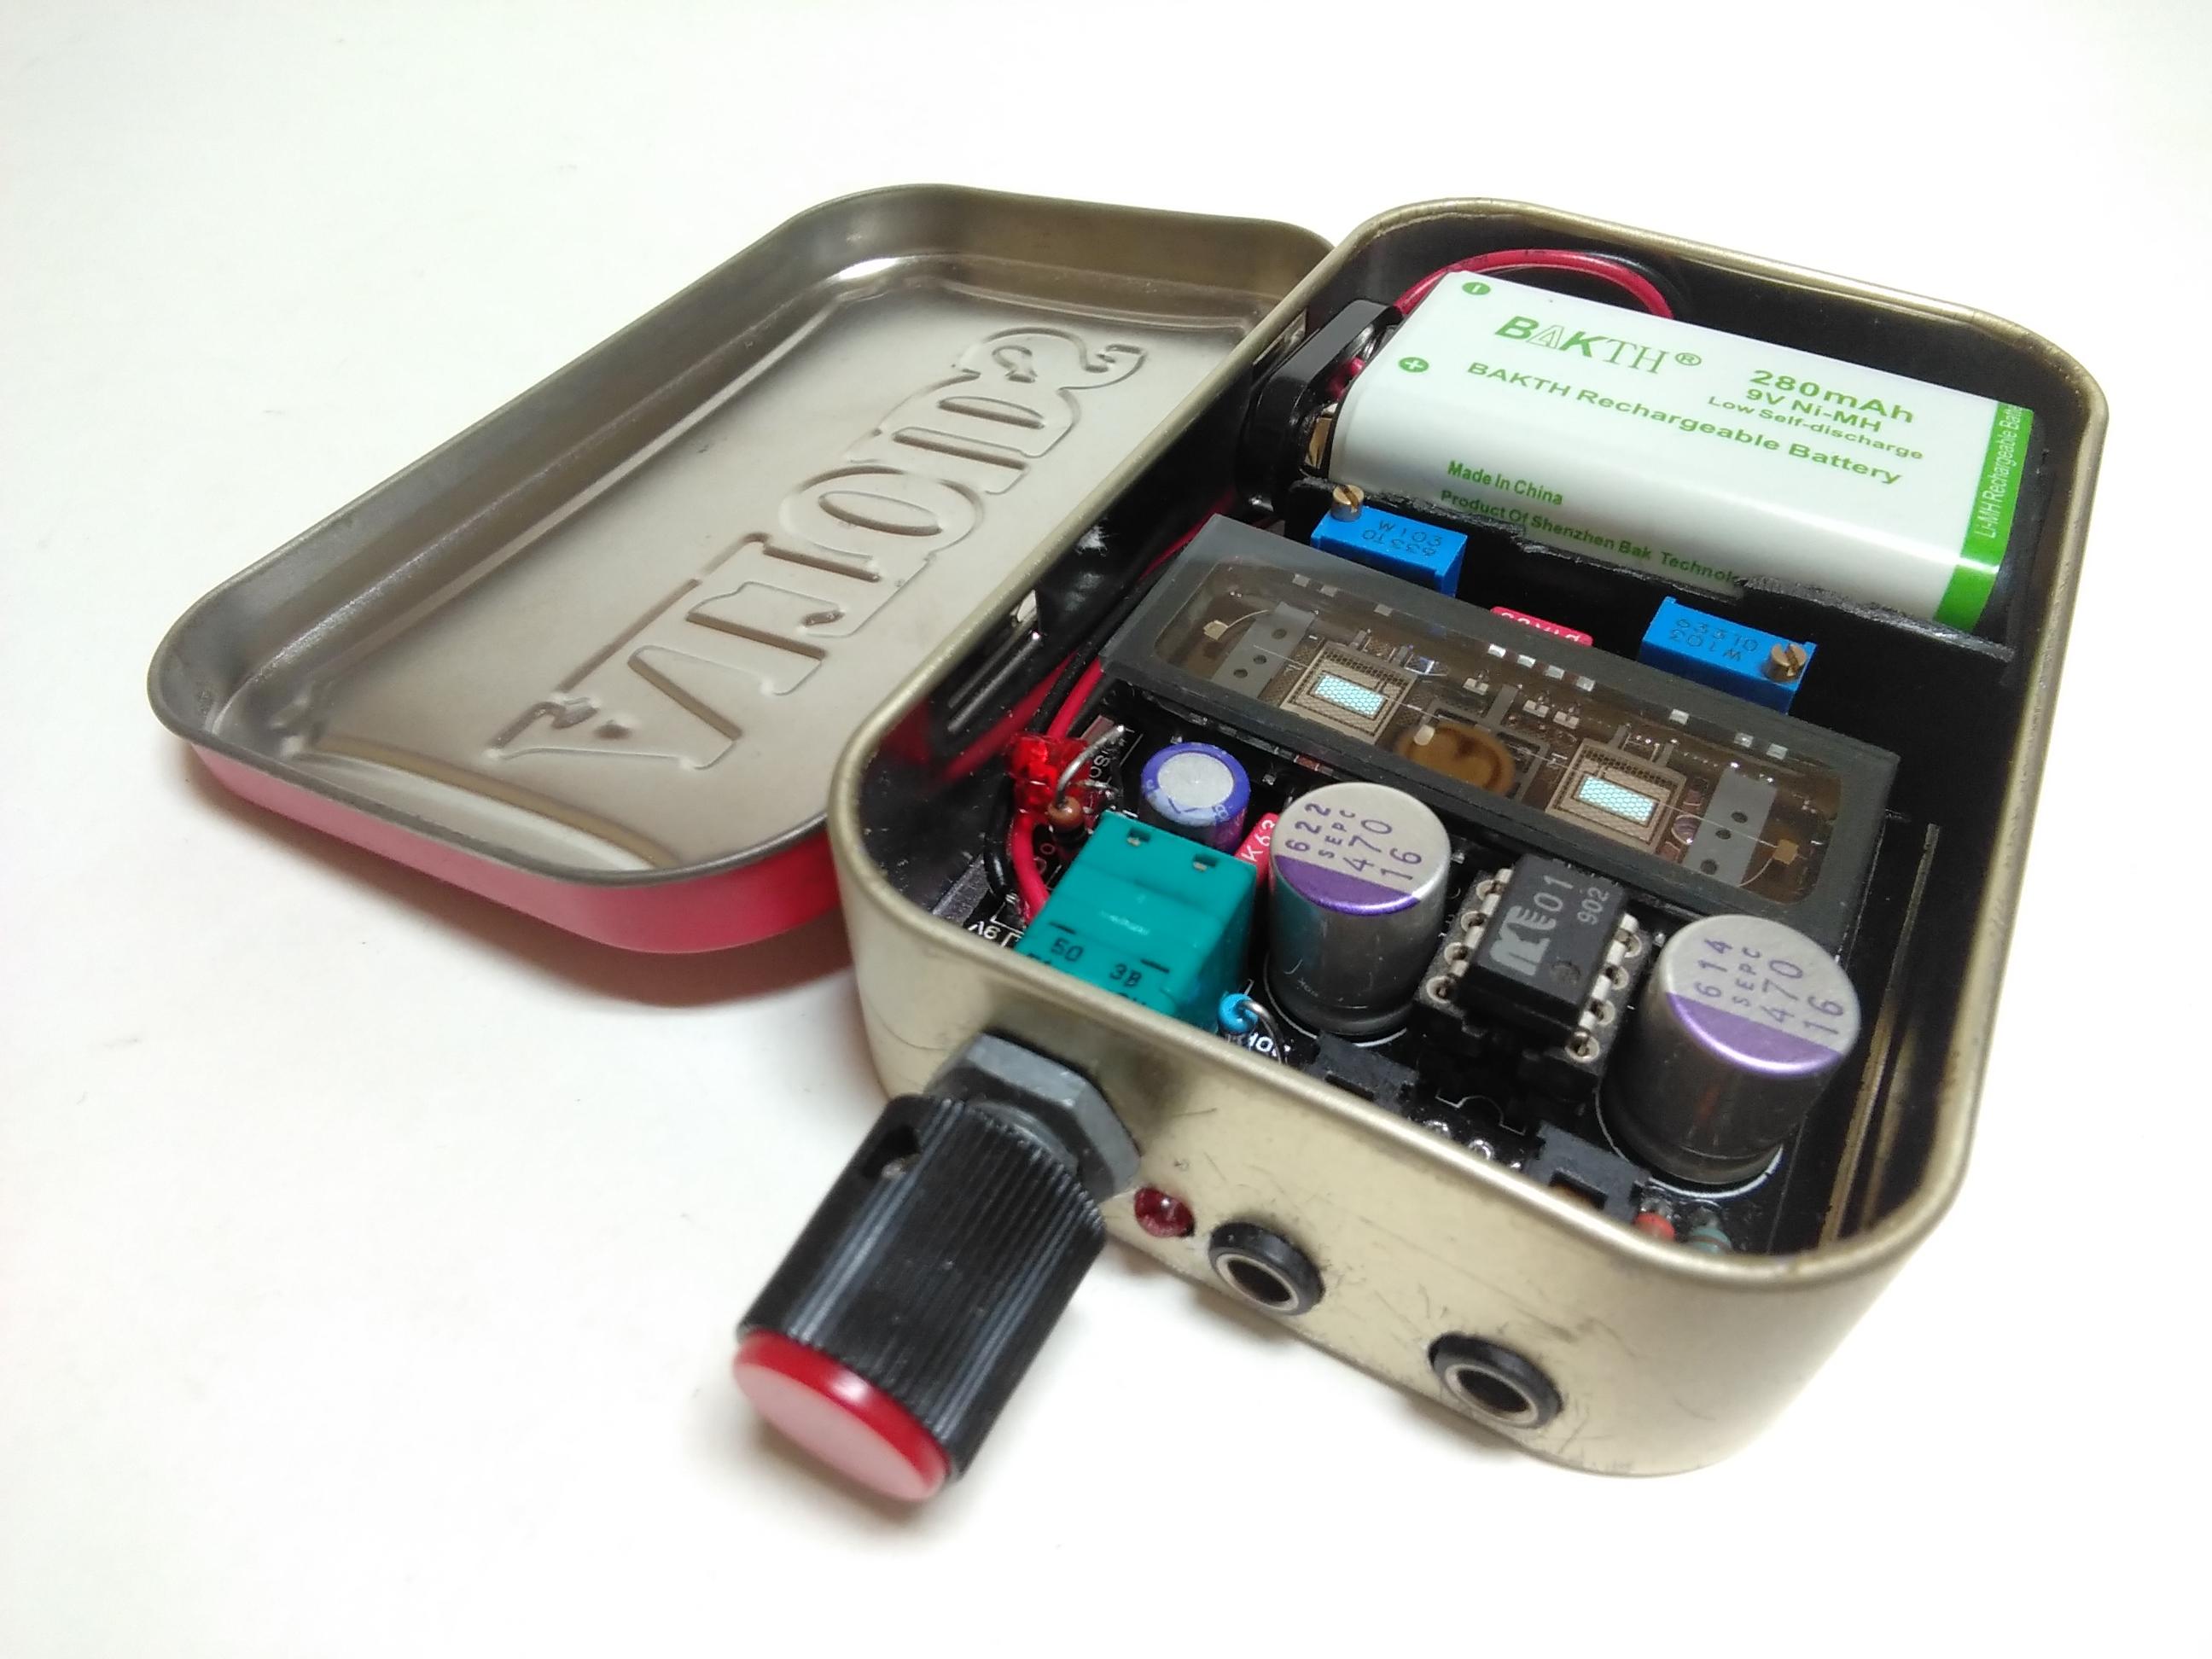 「TE508/HAW」背面カメラ、5Mモードで撮影